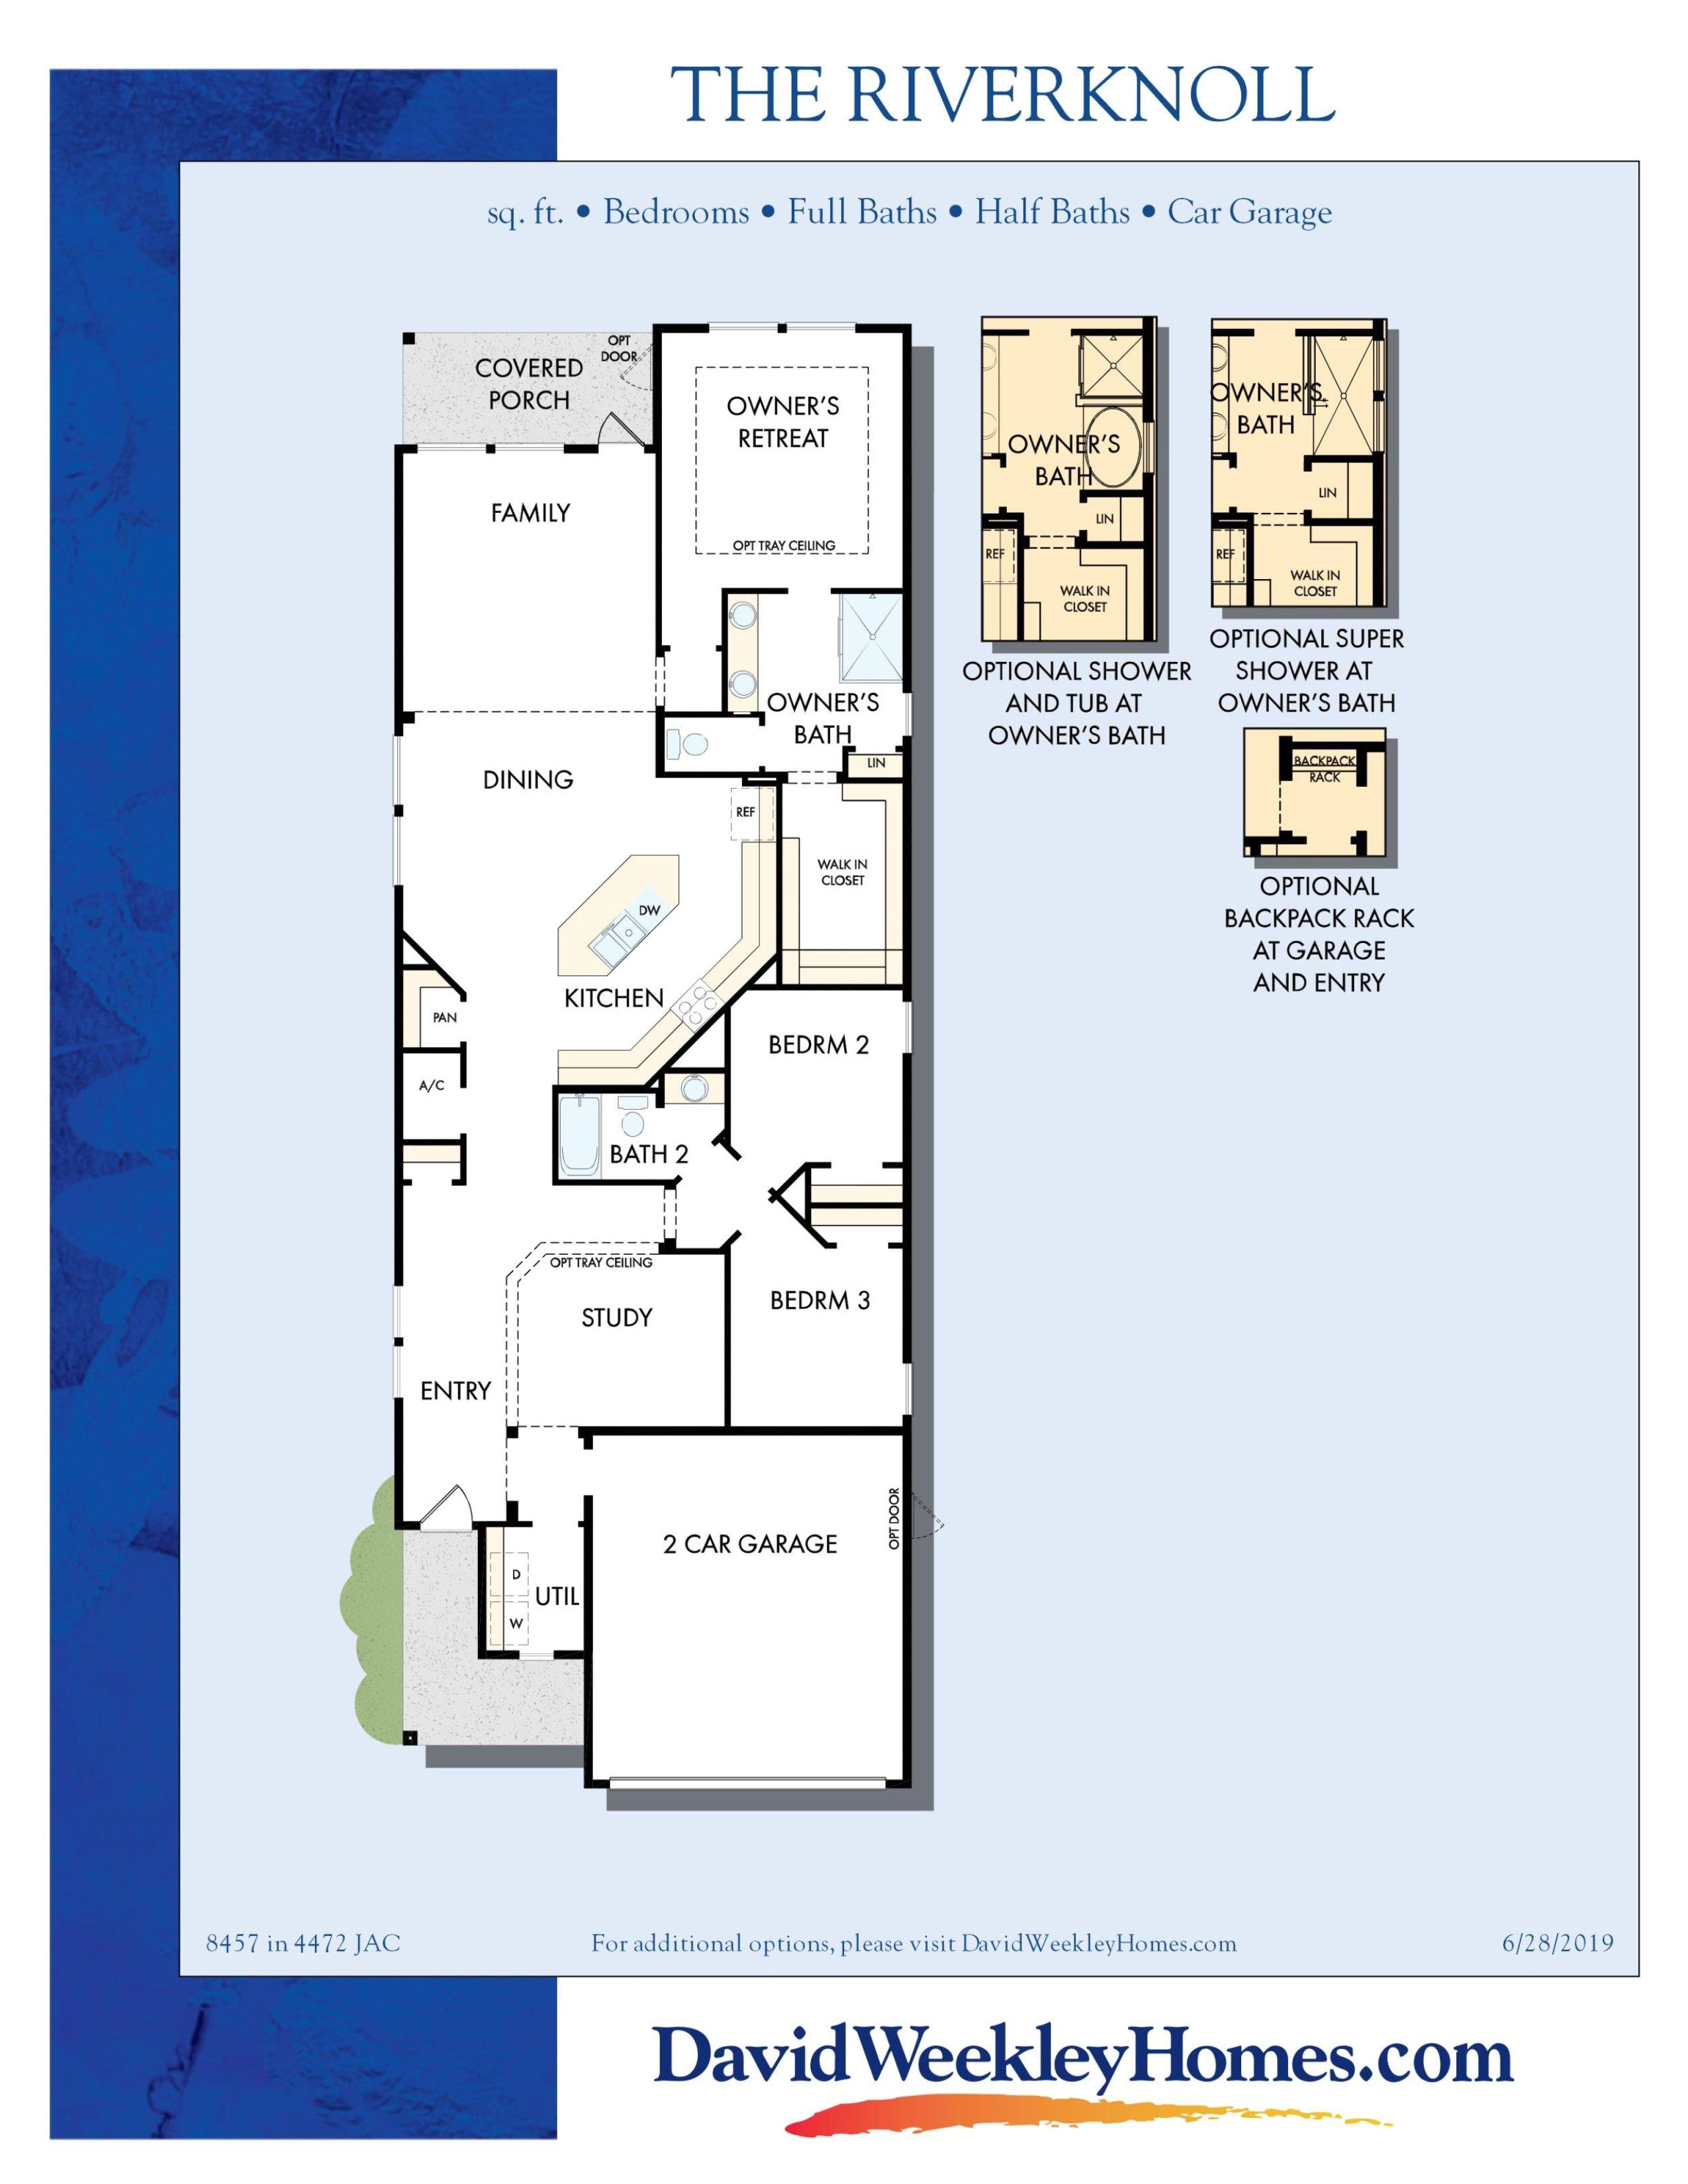 Riverknoll-floorplan-2